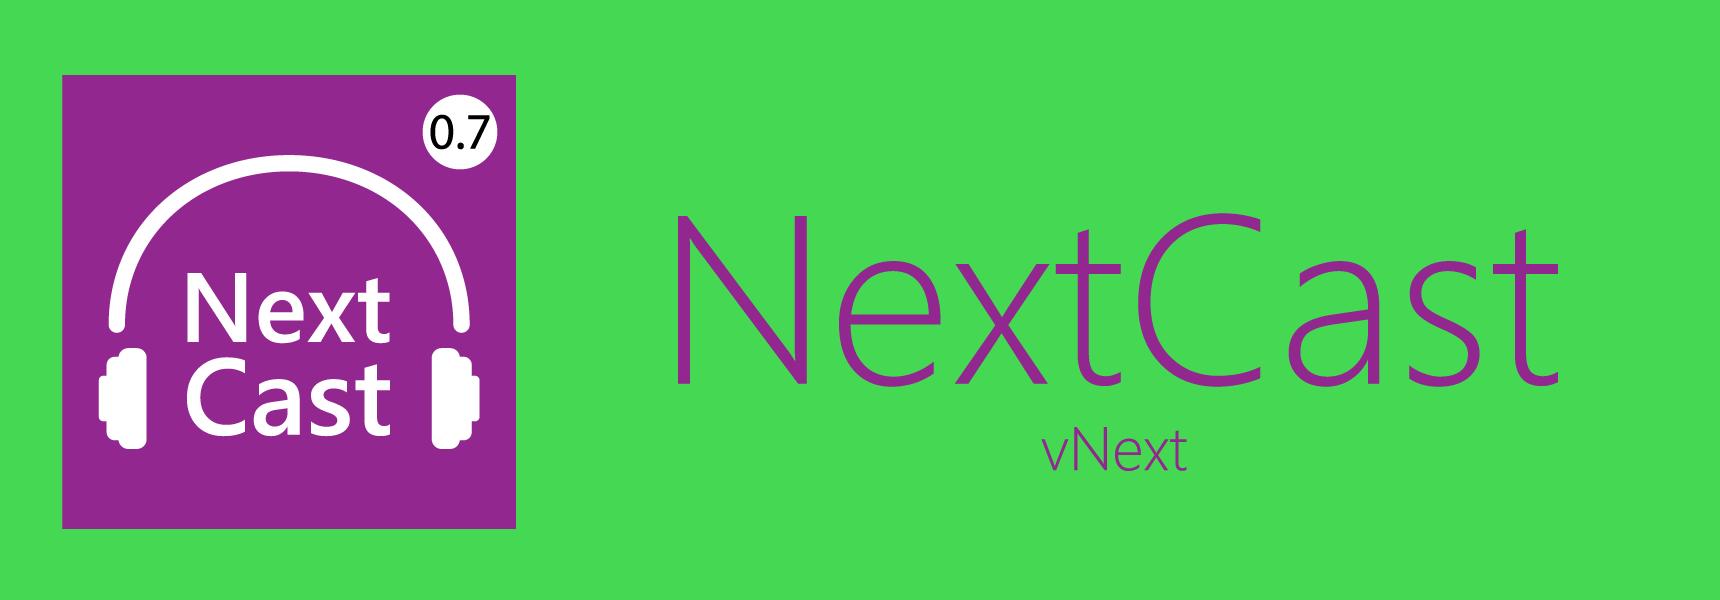 nextcast_07_g